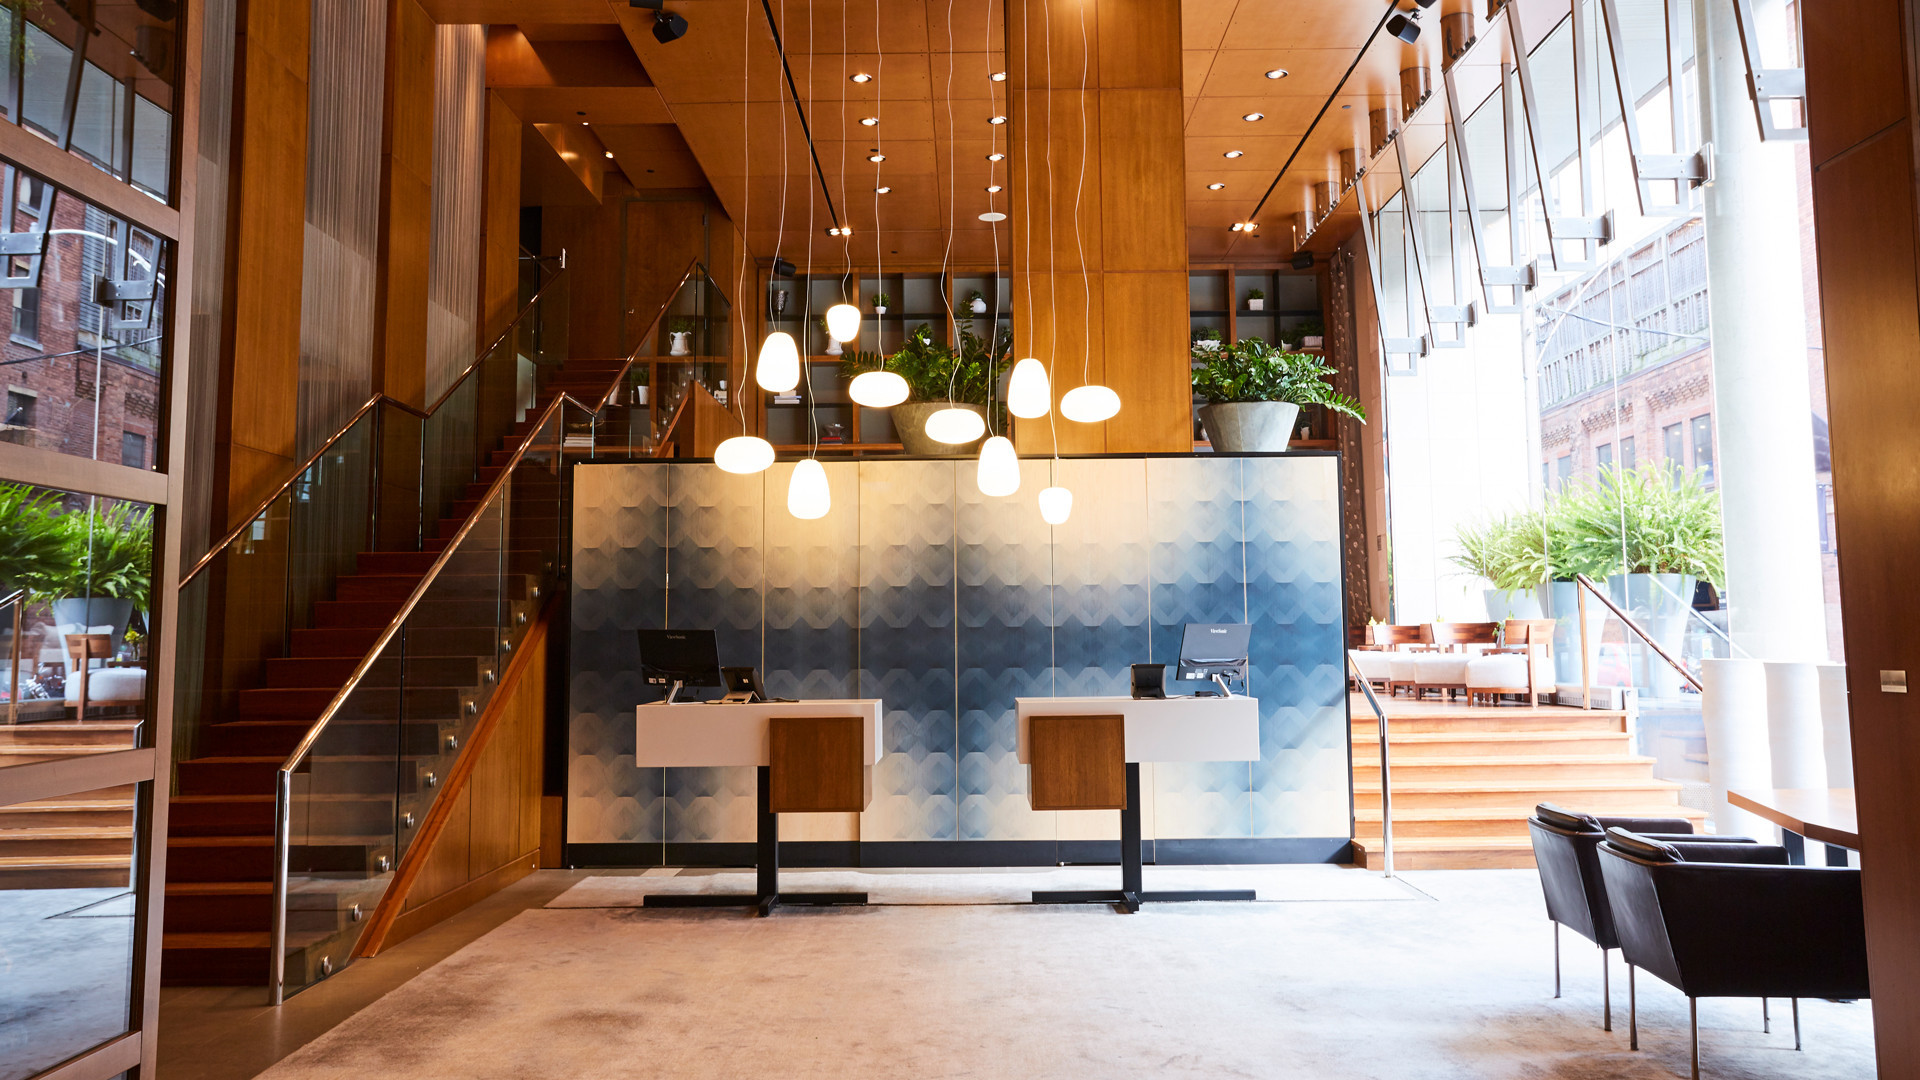 Best hotels Toronto staycation | Le Germain Hotel Toronto Mercer lobby